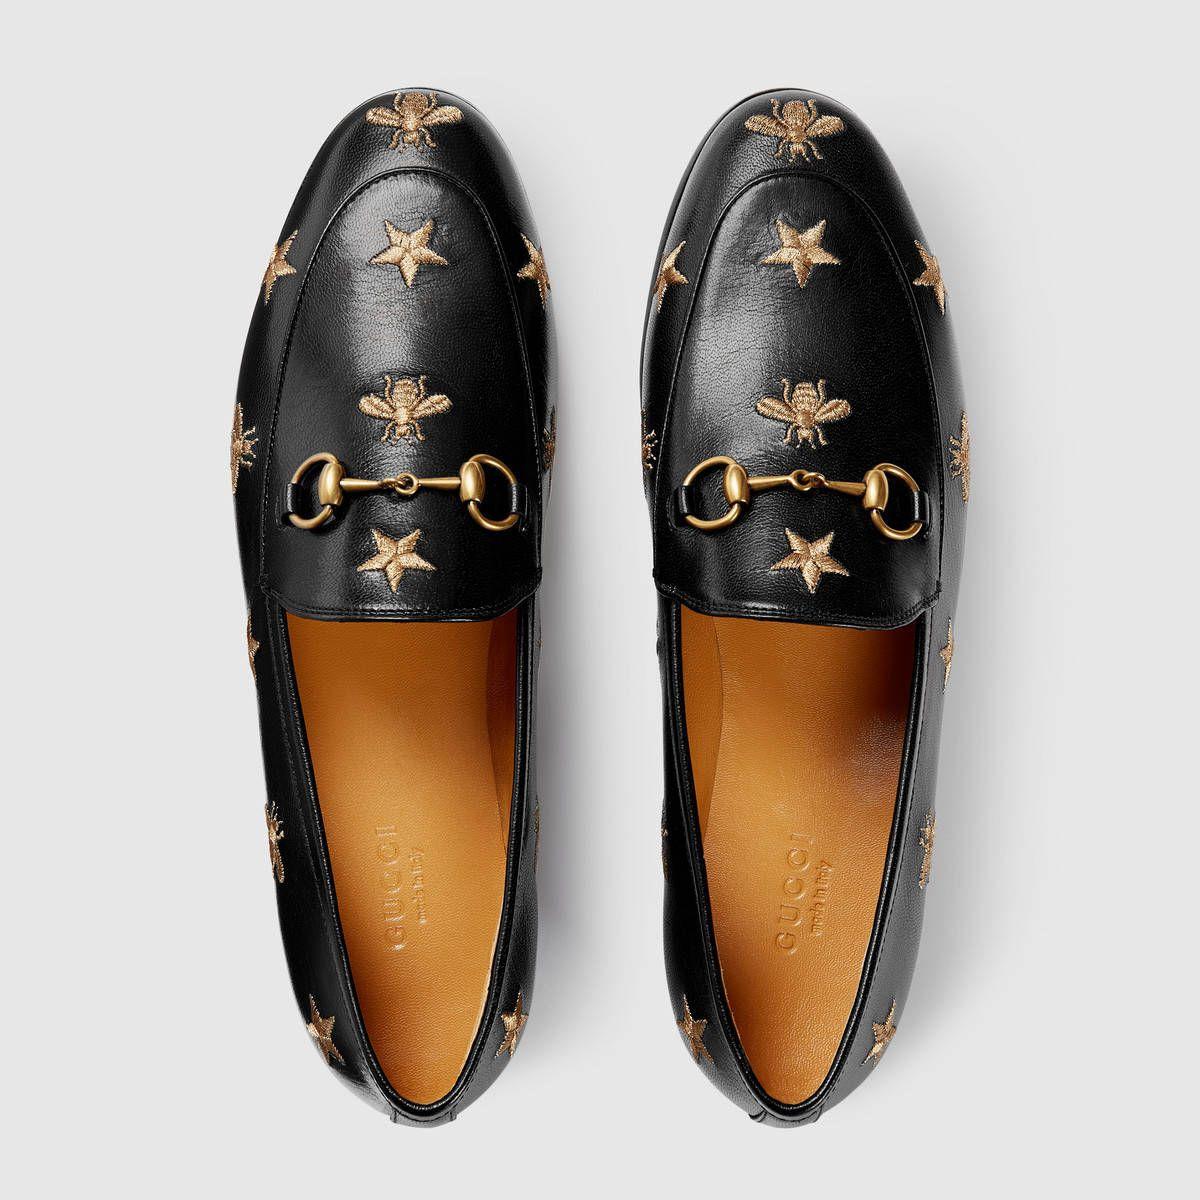 2448a1799 Gucci Gucci Jordaan embroidered leather loafer Detail 3 Calçados Oxford,  Plataforma Sapato, Marcas De